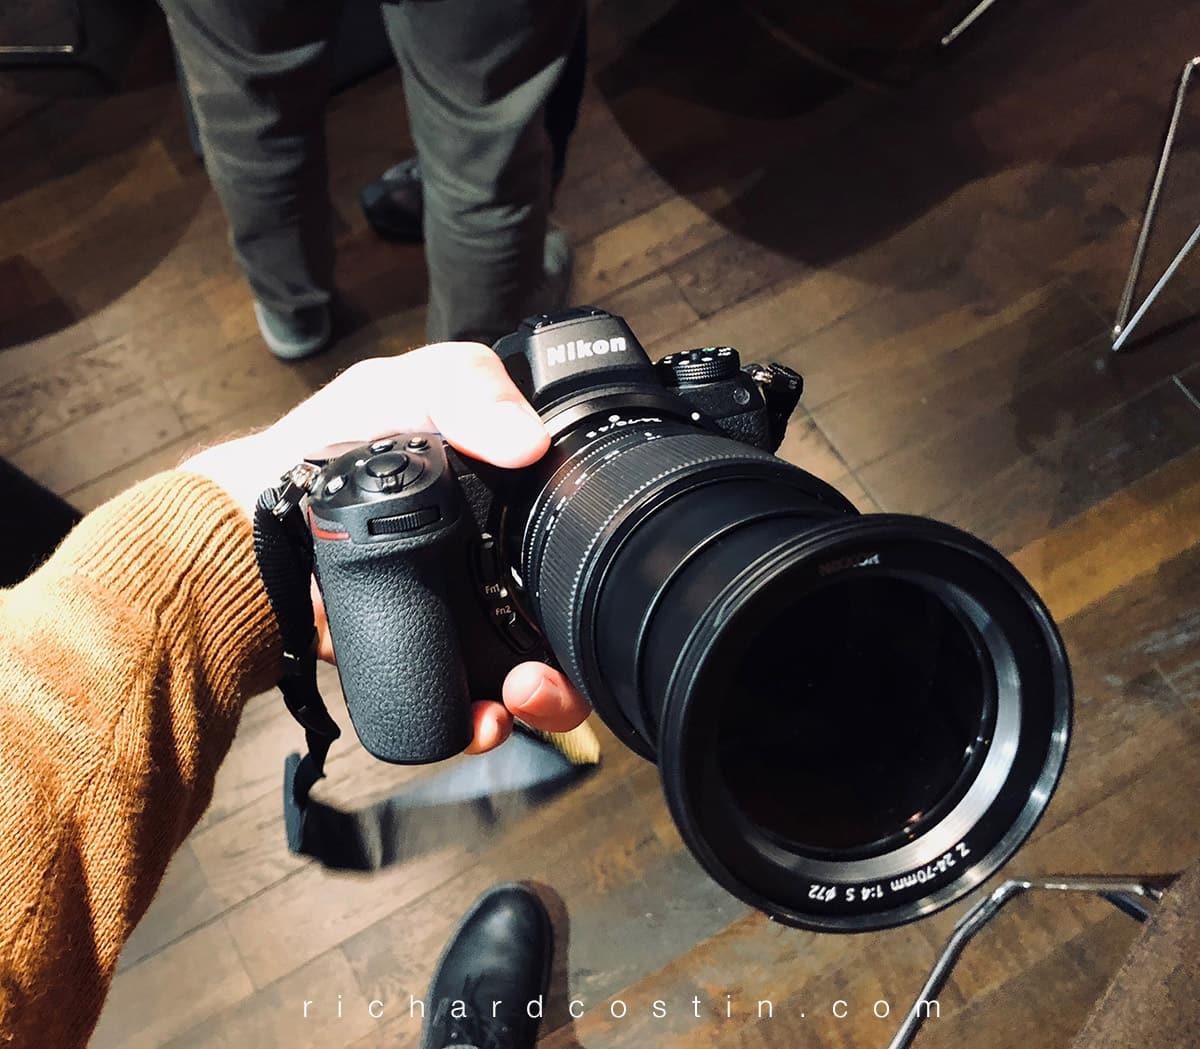 The Nikon Z7 mirrorless camera held by wildlife photographer Richard Costin